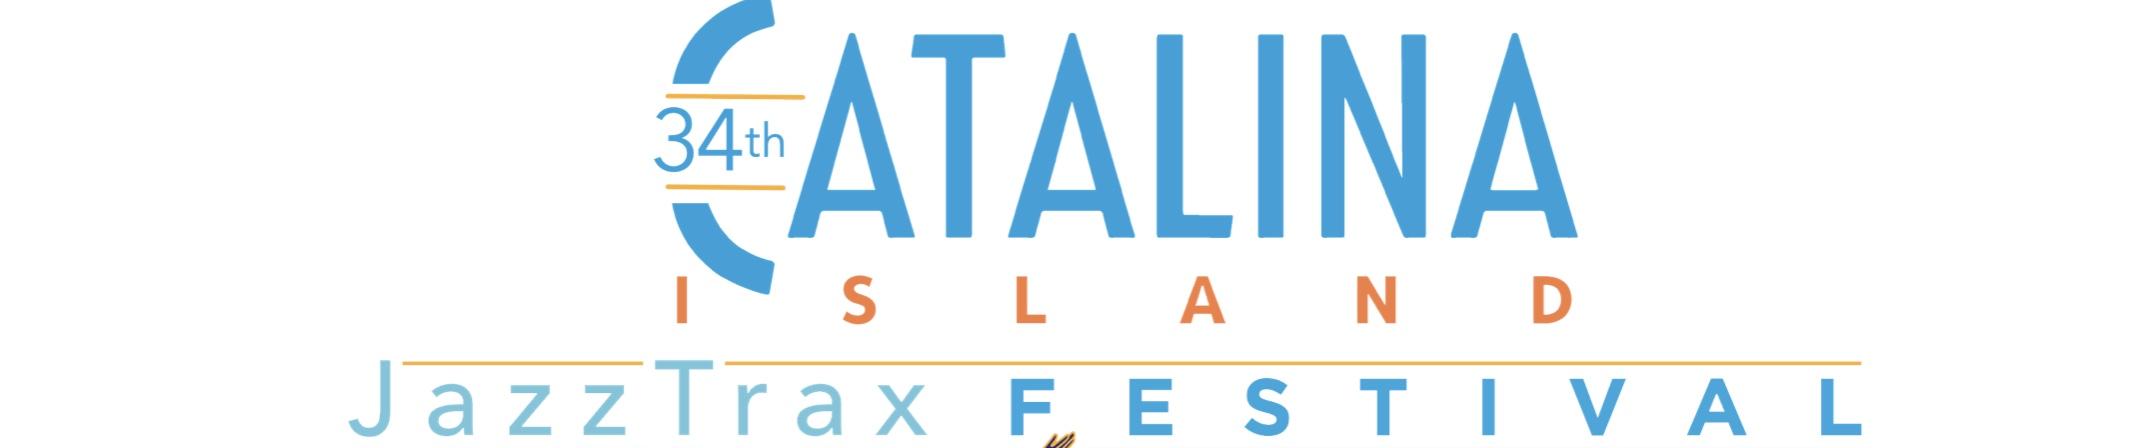 Catalina Island JazzTrax Festival 2021 Tickets